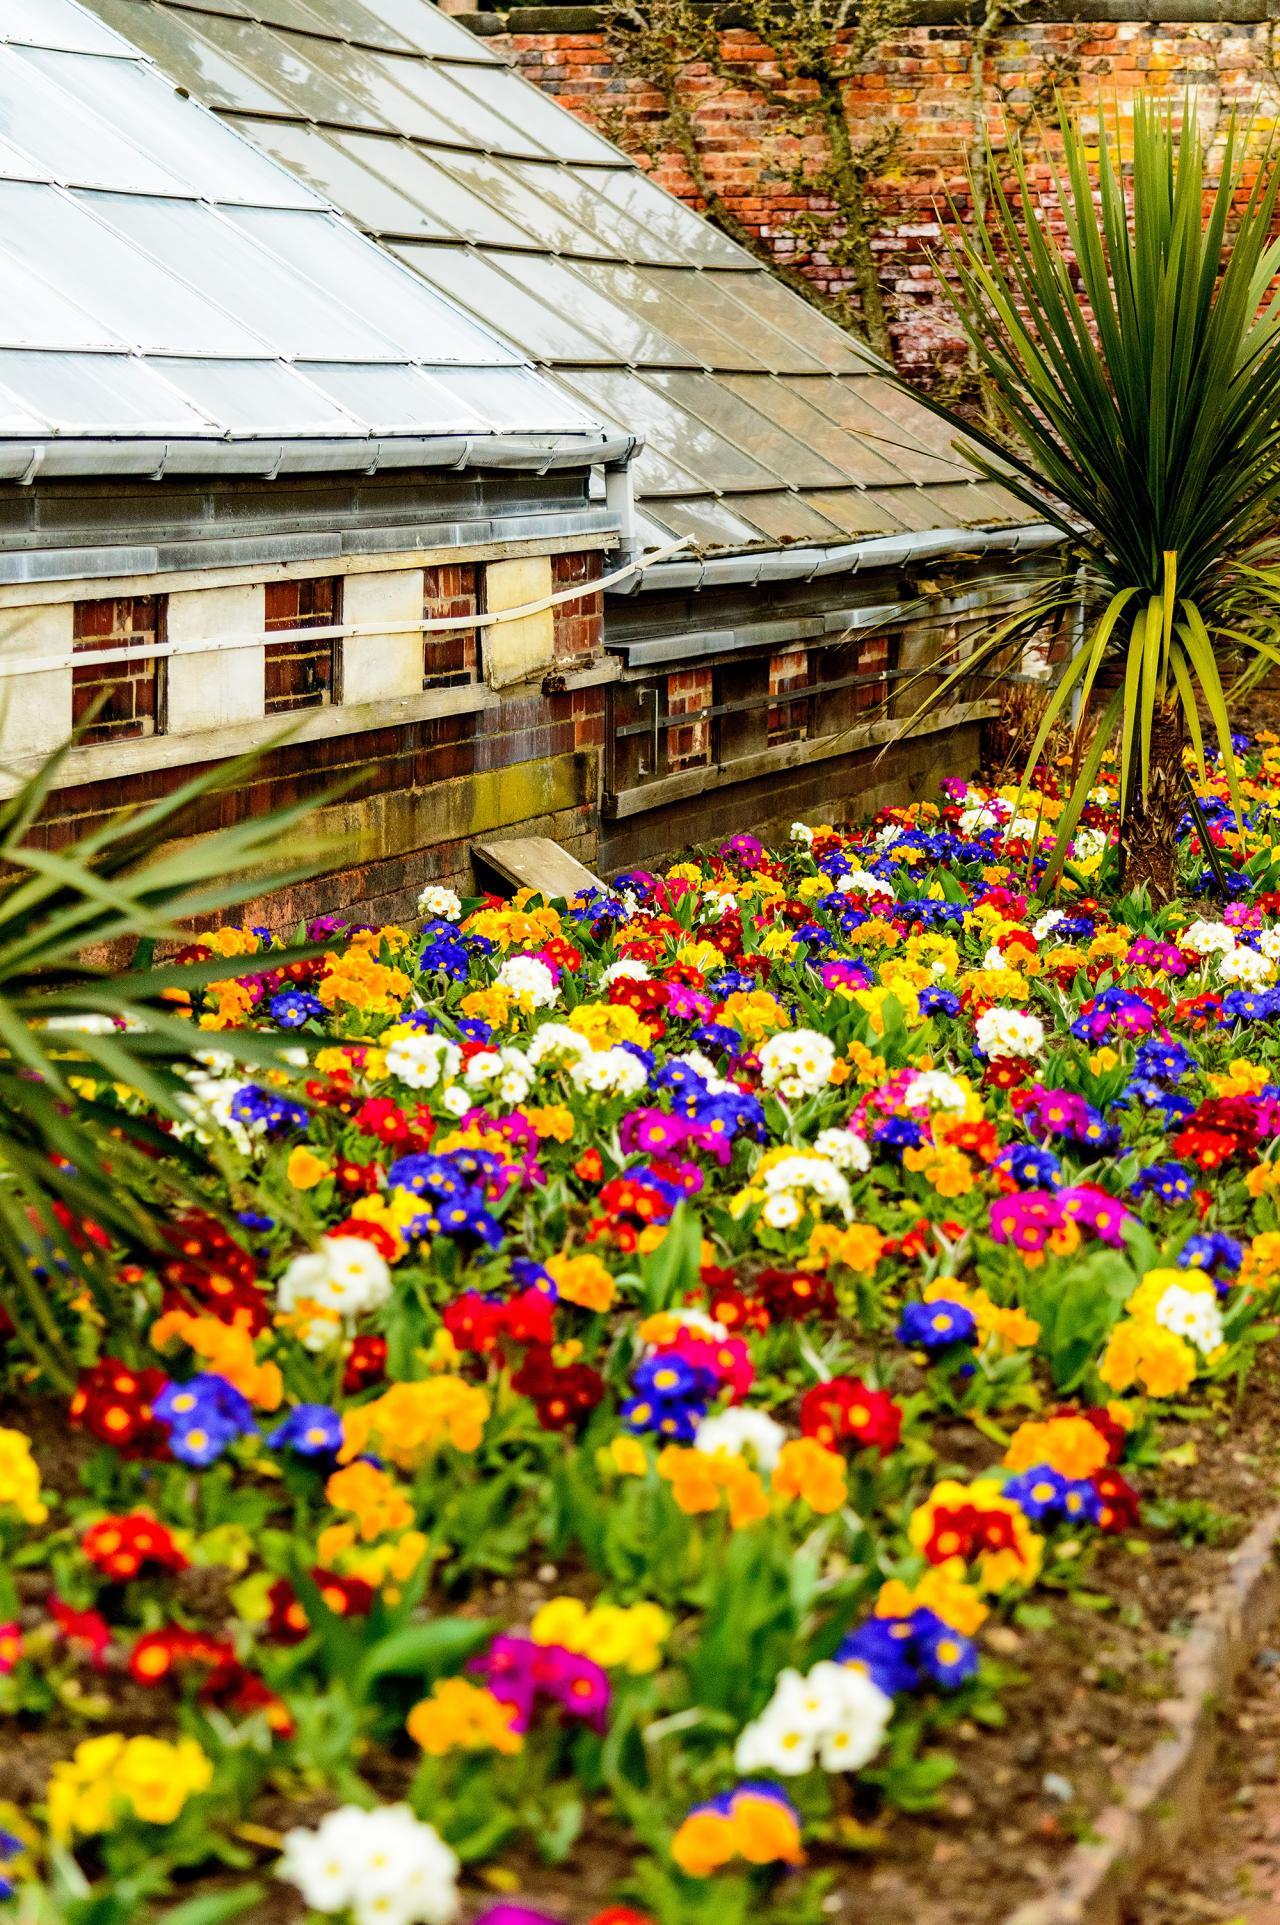 Dise os atractivos para jardines peque os lifestyle de am ricaeconom a artes dise o estilo - Plantas de jardin fotos ...